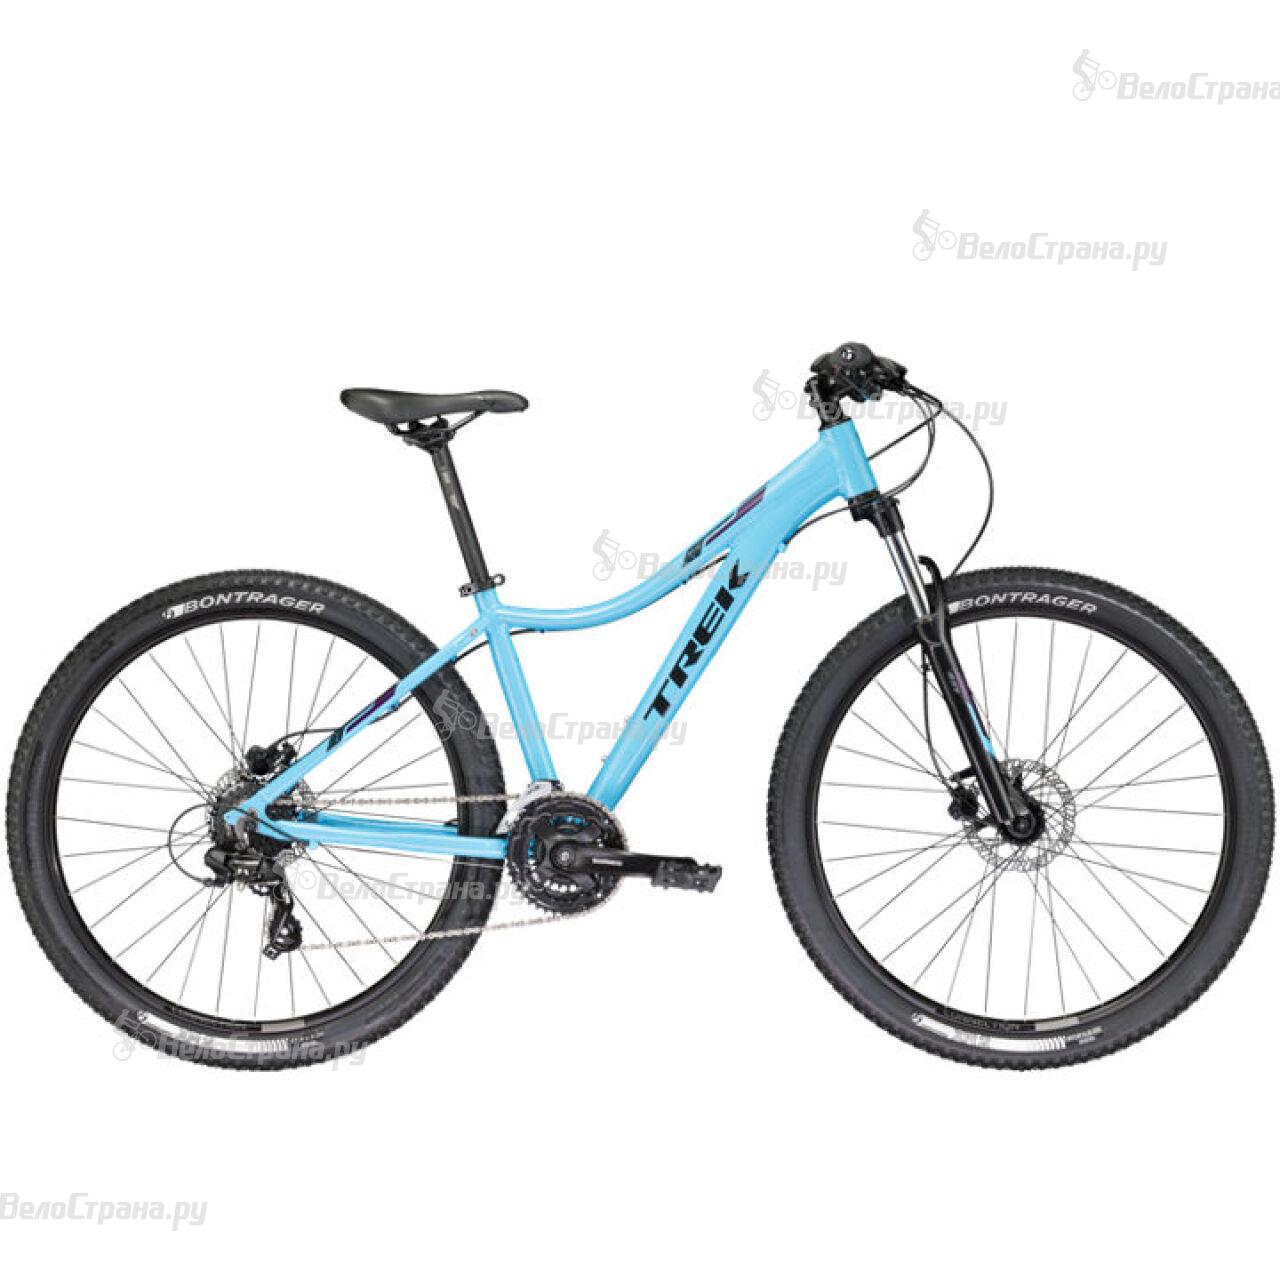 Велосипед Trek Skye SL WSD 29 (2017) цены онлайн